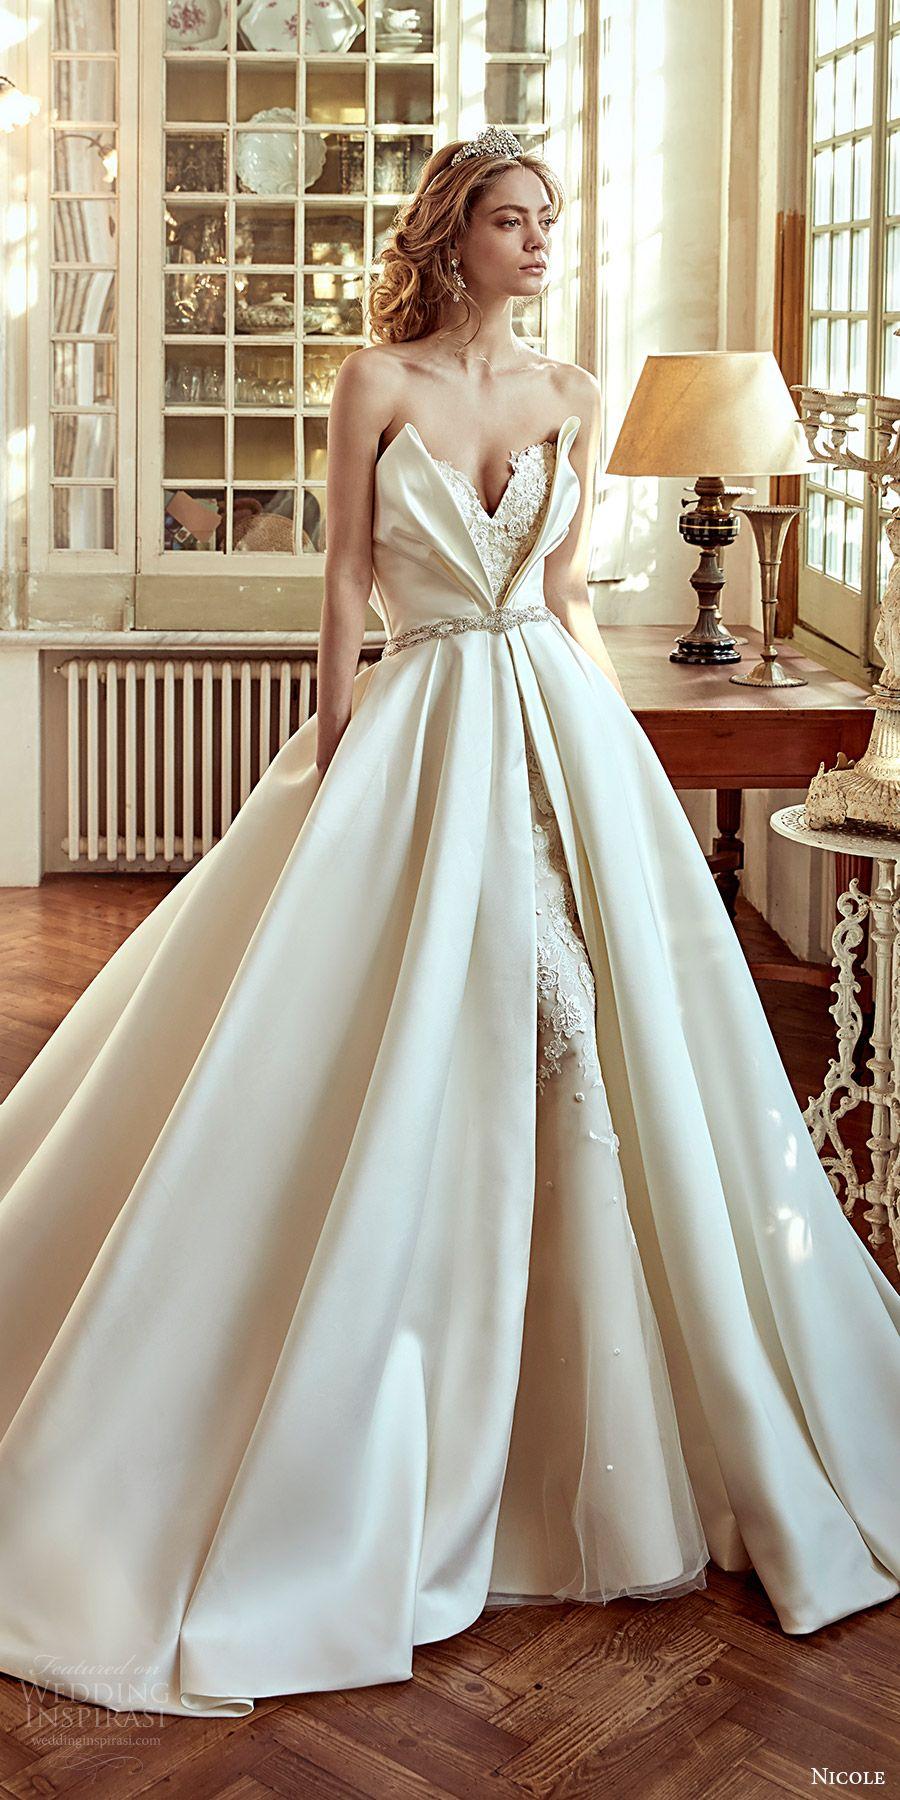 Nicole wedding dresses in dresses ium in love with